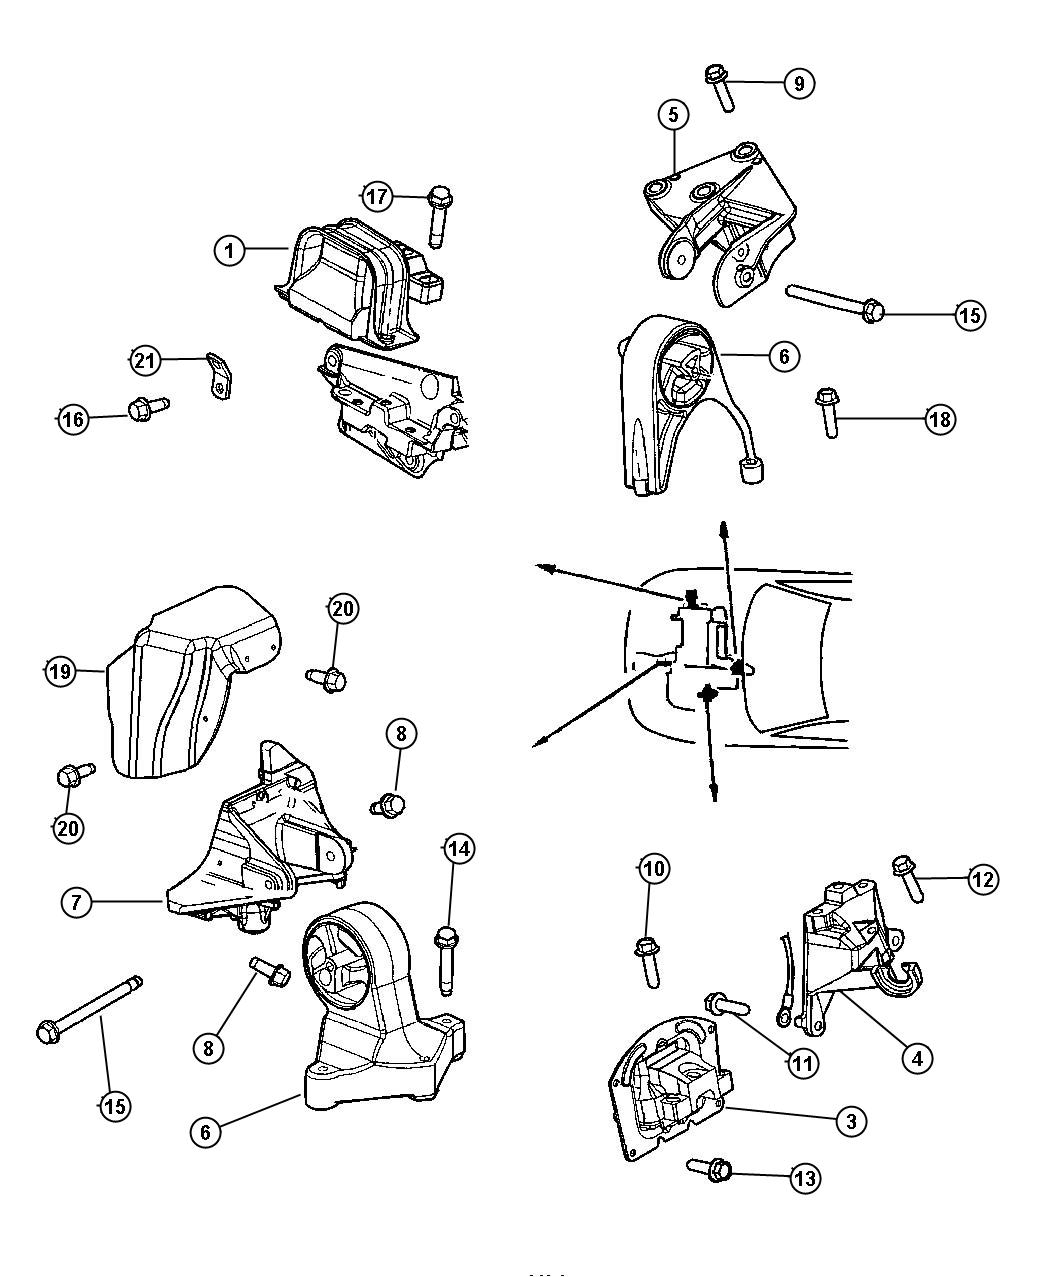 Chrysler Sebring Bolt, used for: bolt and coned washer